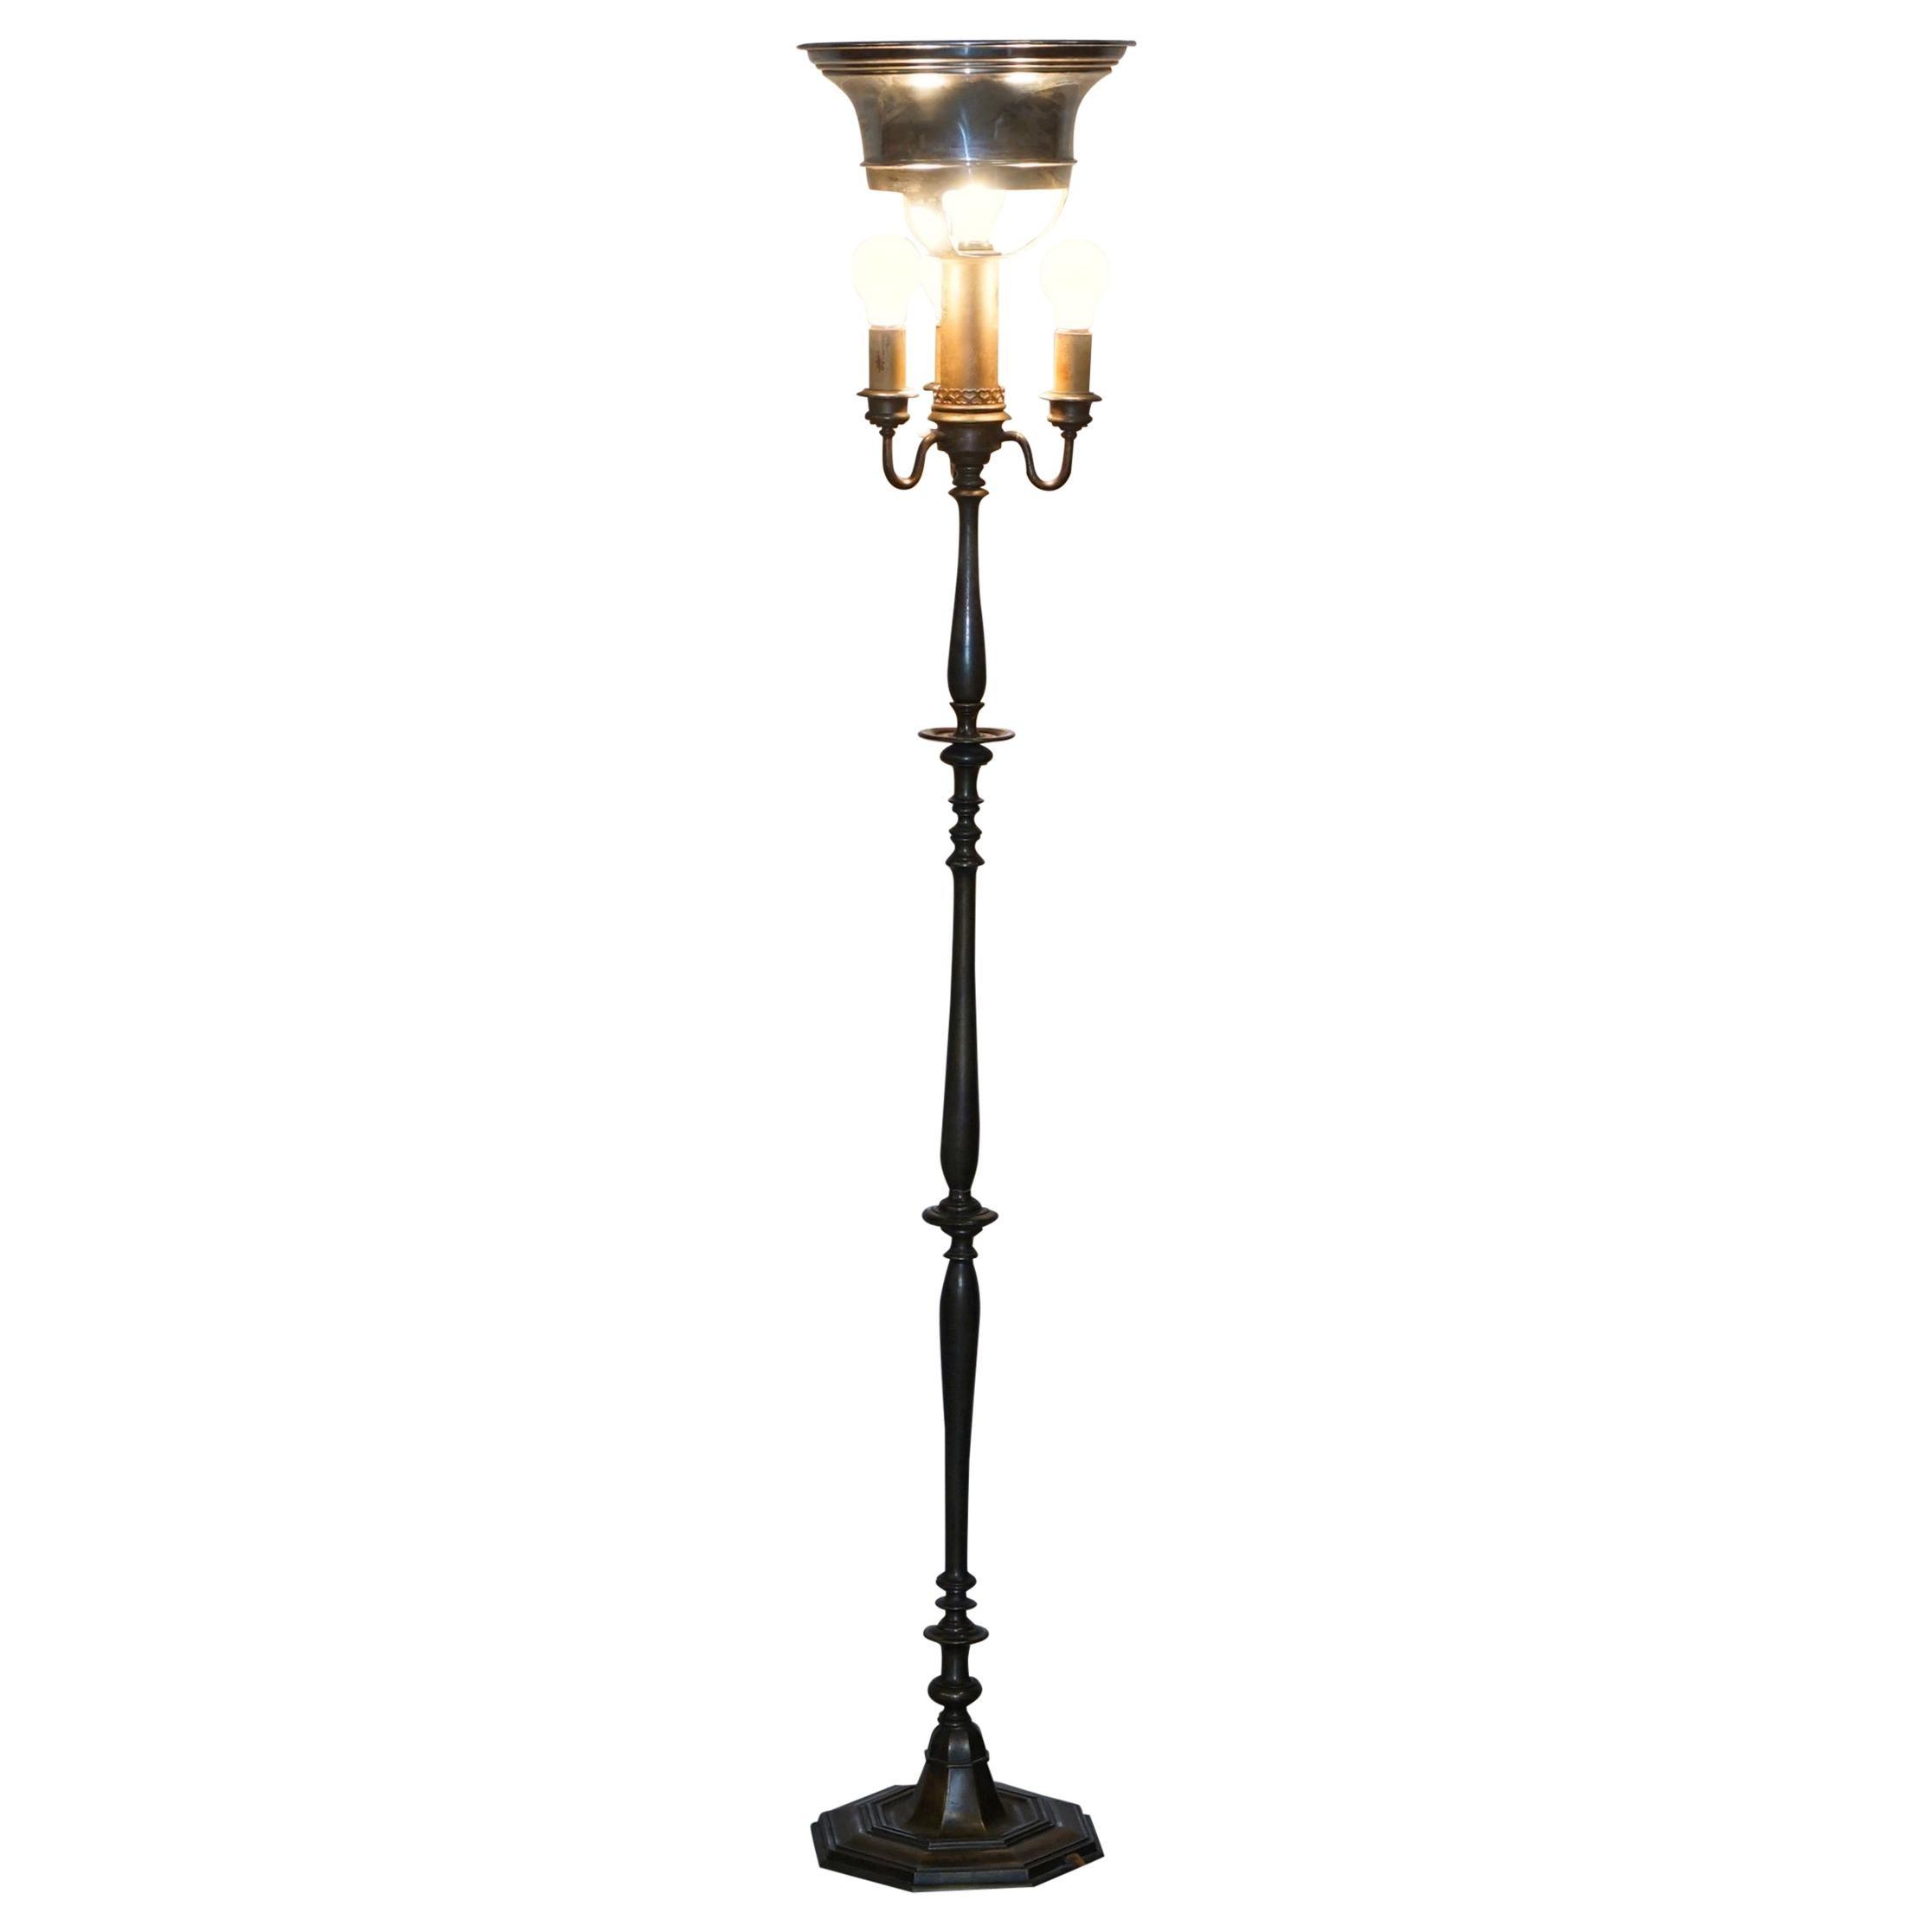 Bakelite Floor Lamps 18 For Sale At 1stdibs